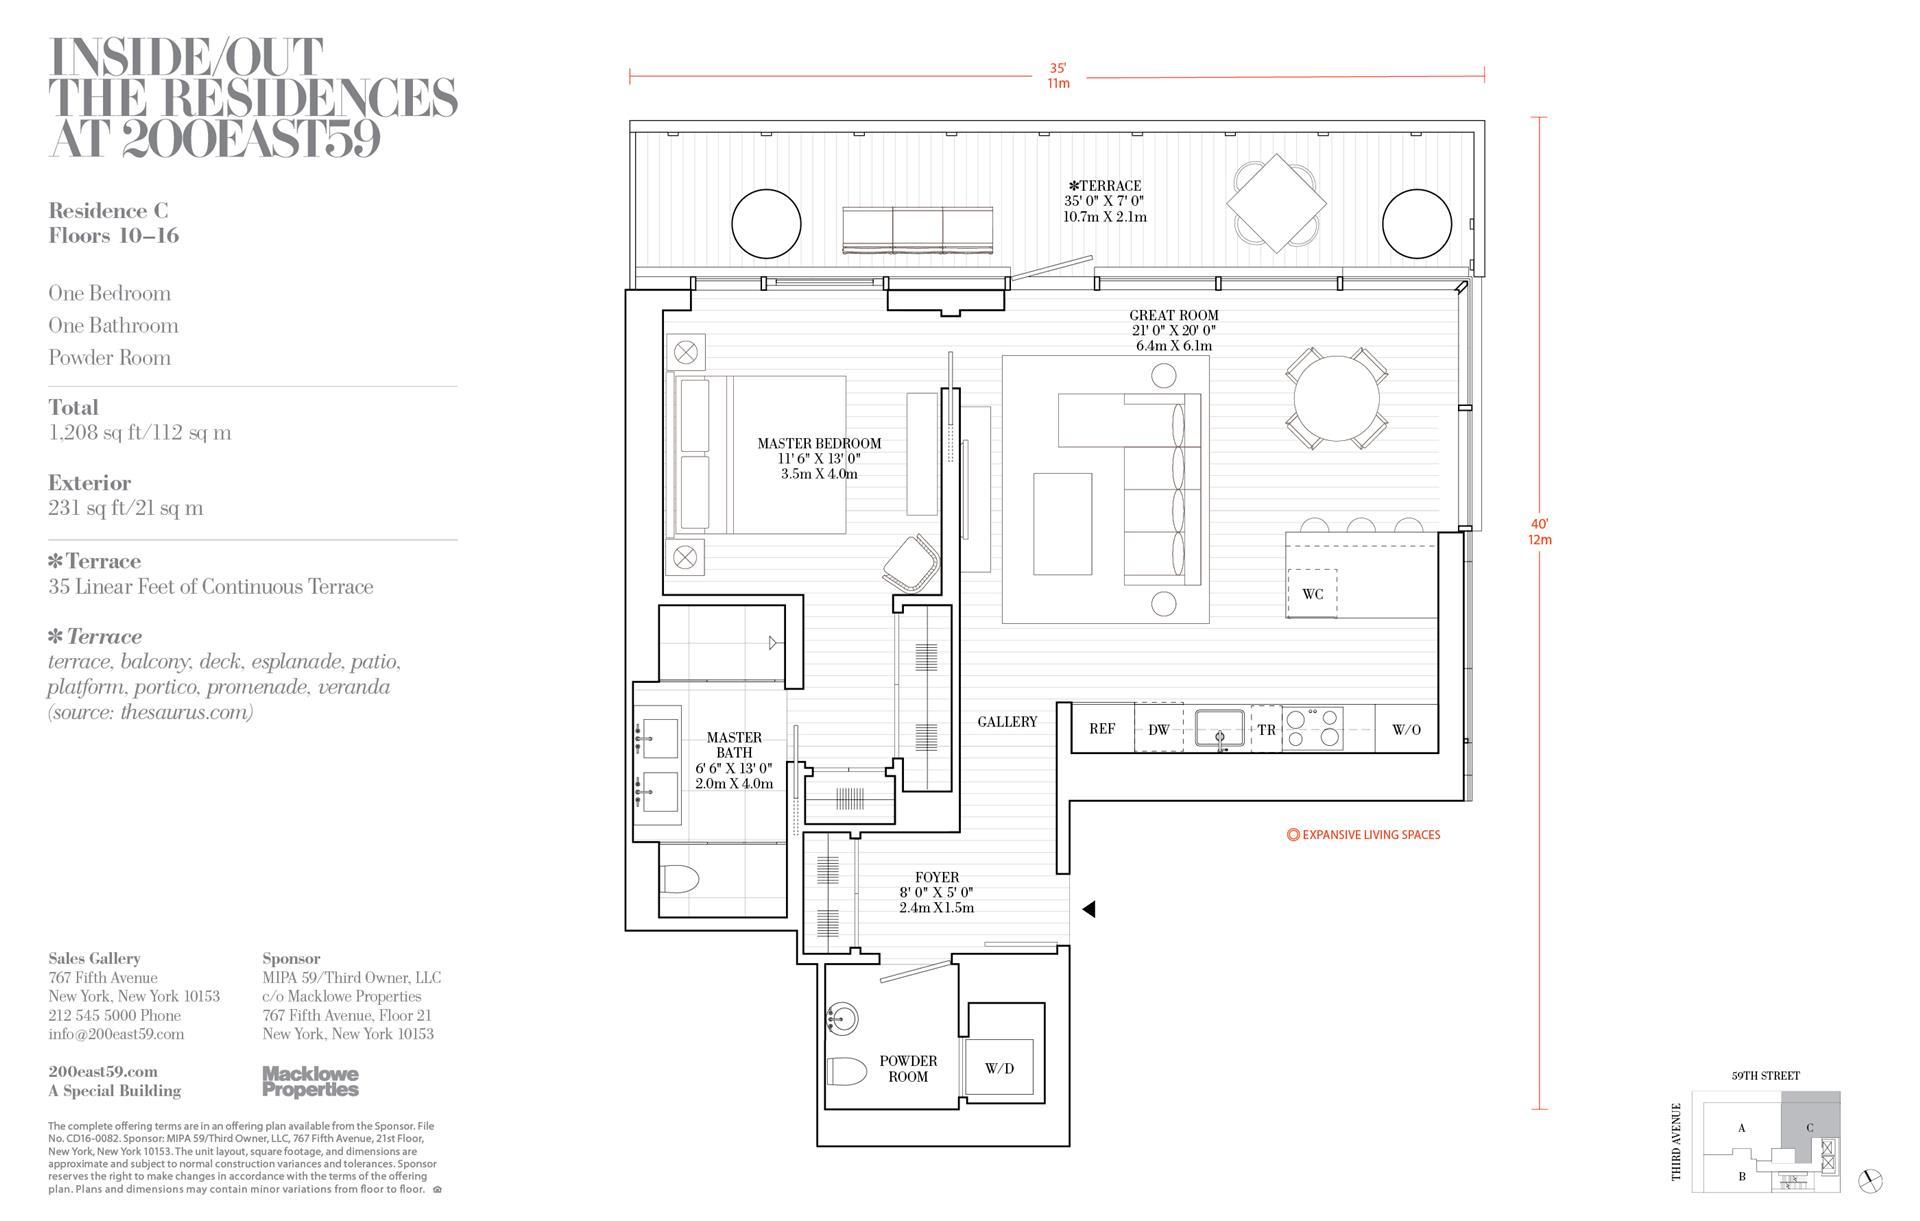 Floor plan of 200 East 59th St, 14C - Midtown, New York